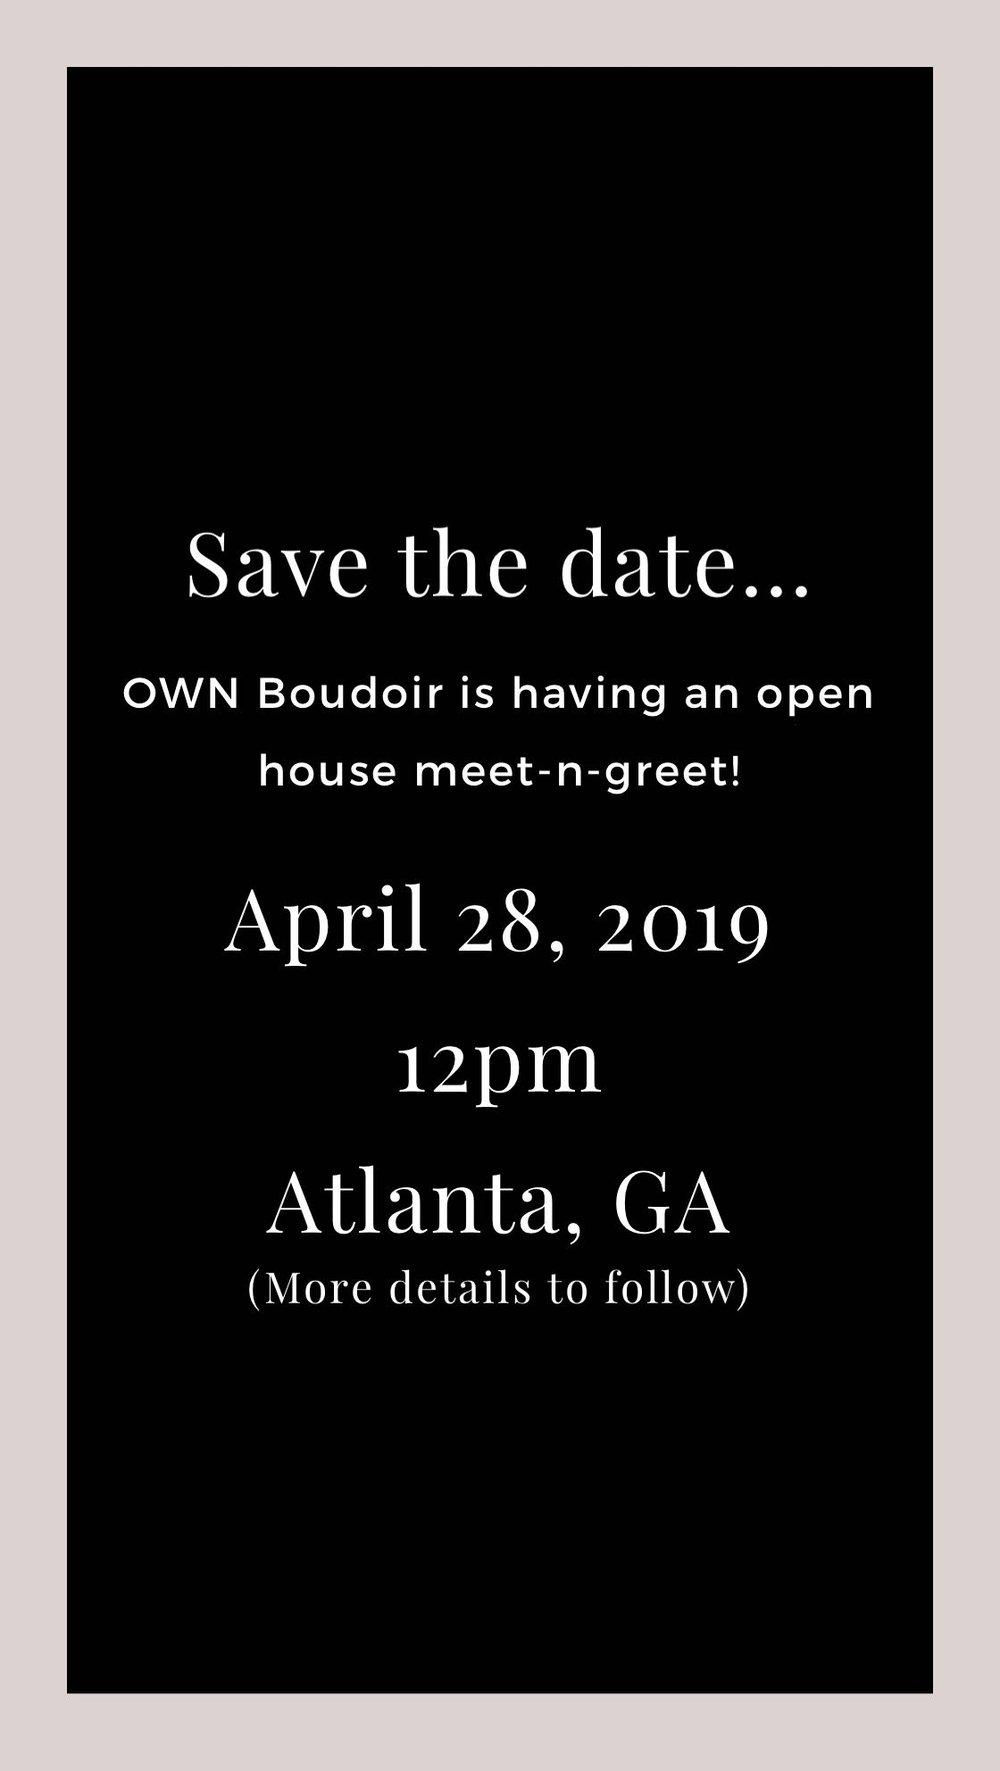 boudoir party, atlanta boudoir, atlanta boudoir photographer, boudoir session , atlanta boudoir photography, open house atlanta